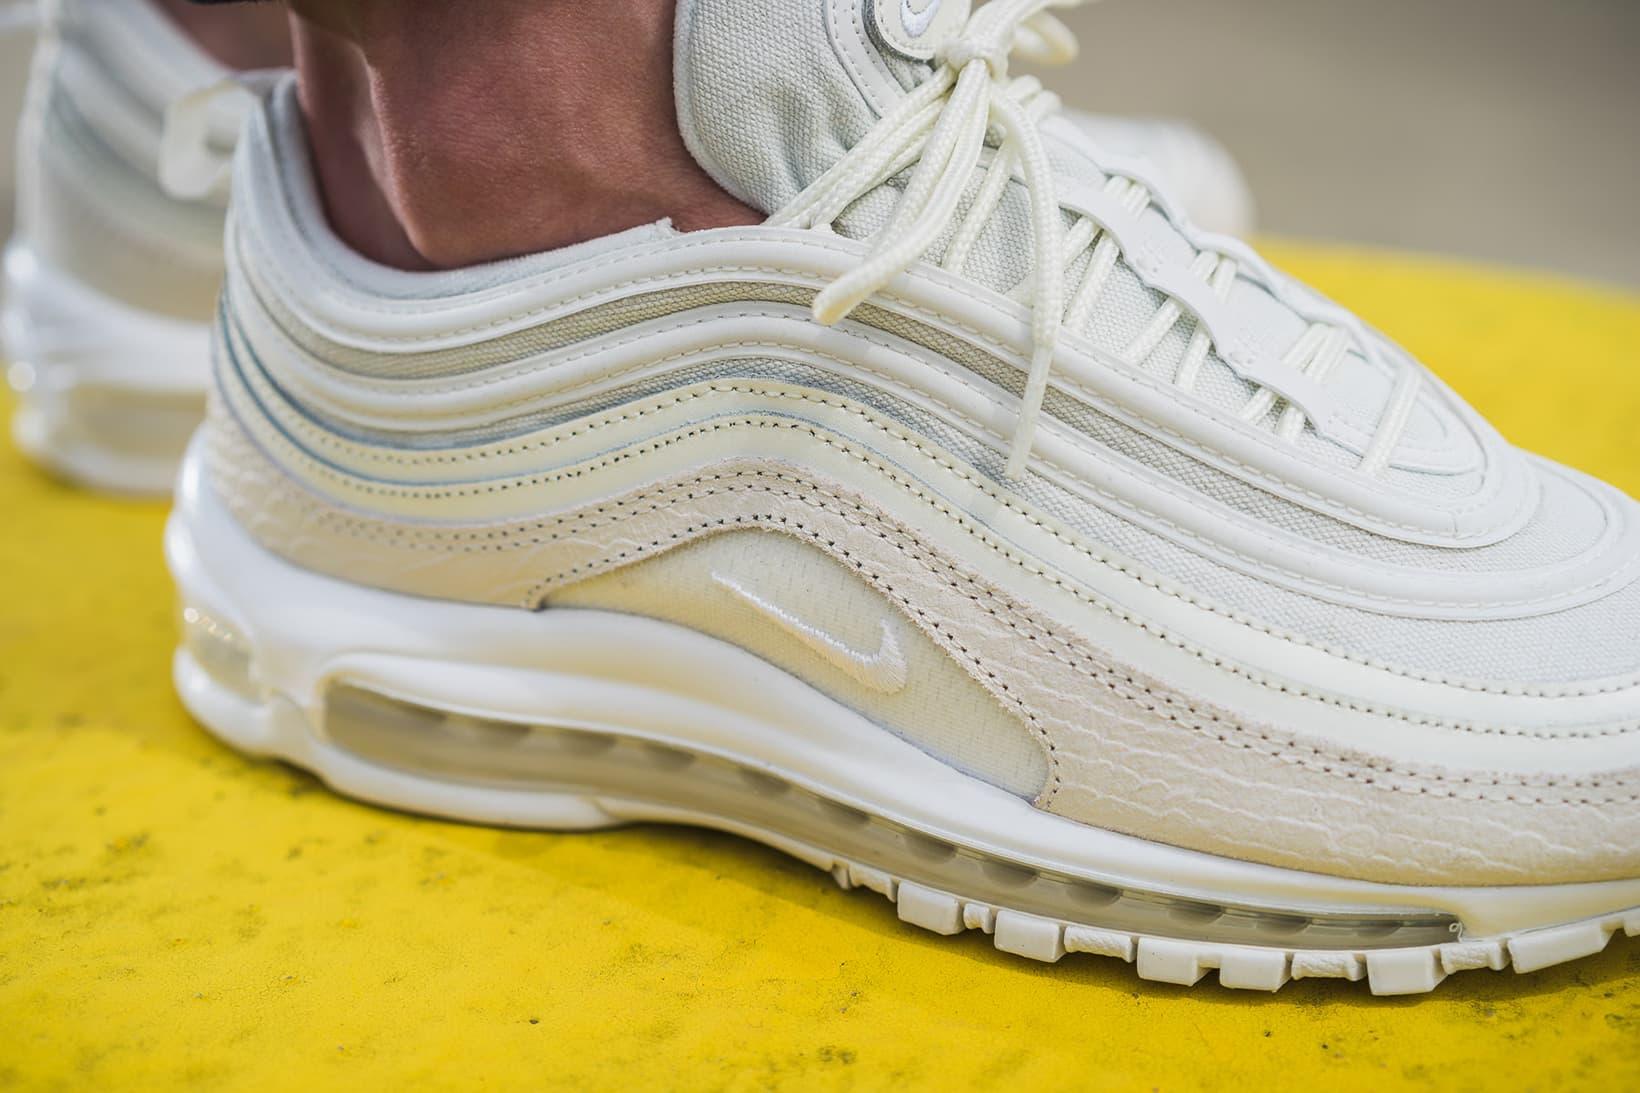 Nike Air Max 97 White Snakeskin On Feet Hypebeast